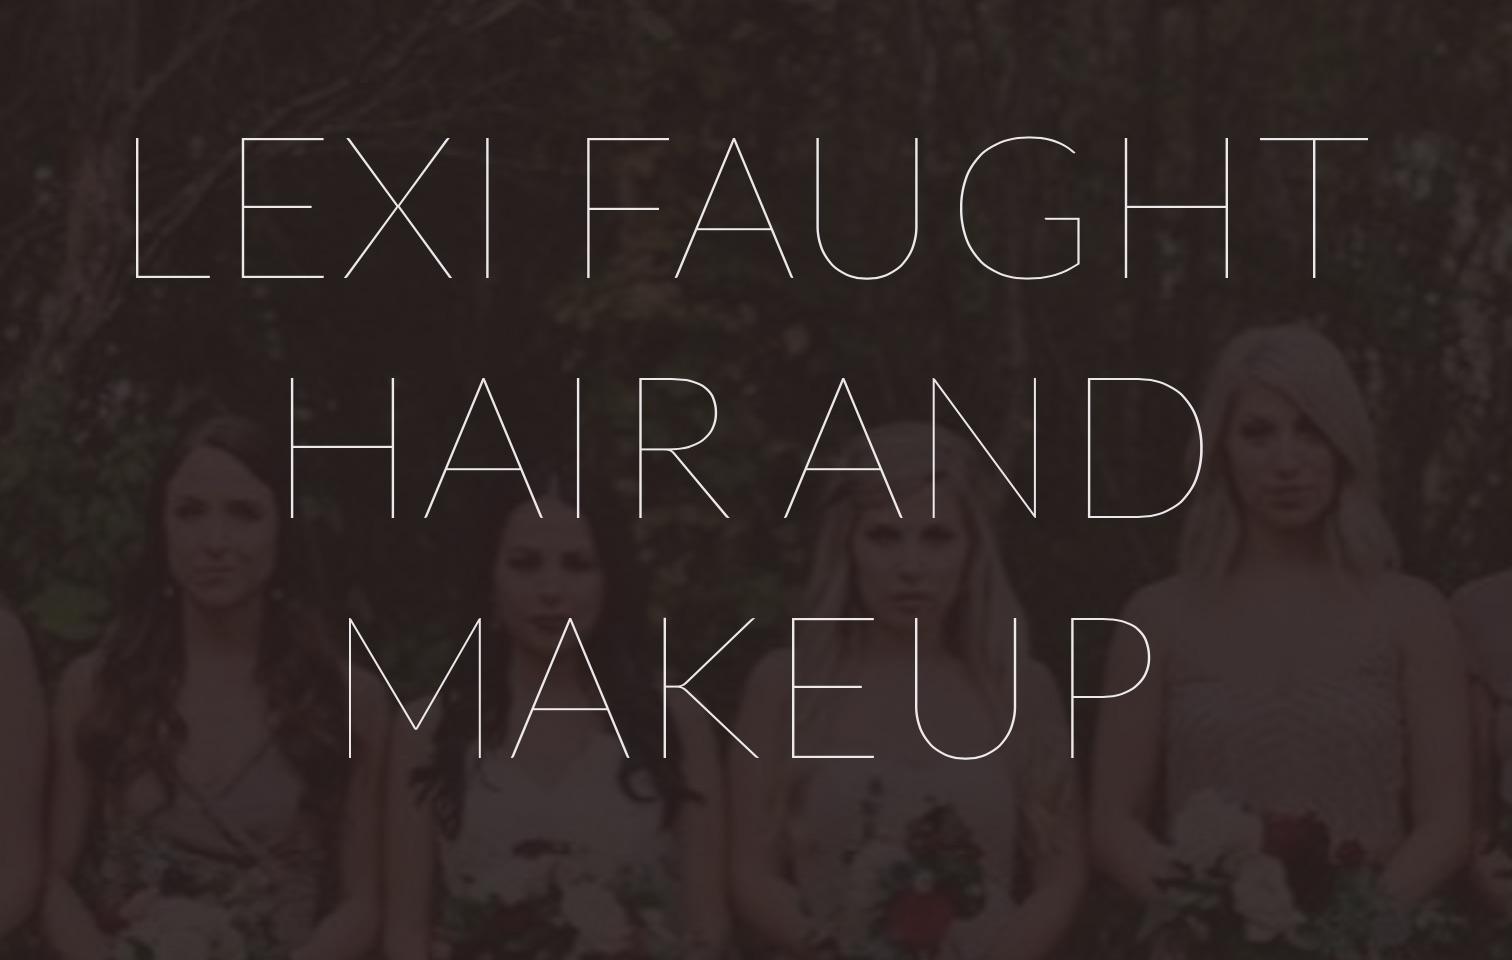 Lexi Faught Hair and Makeup - Oklahoma Wedding Beauty